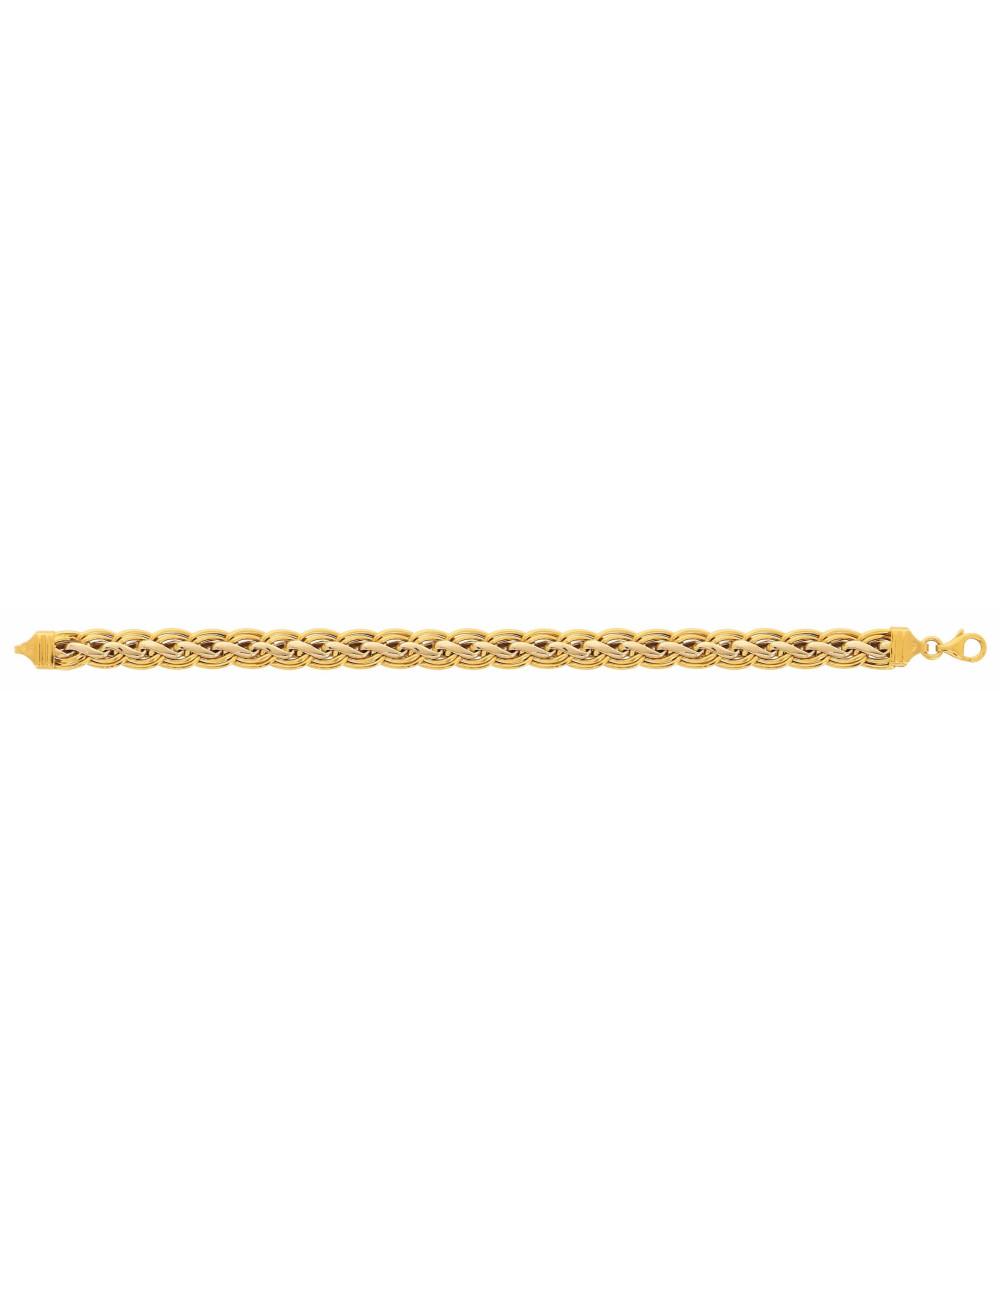 Bracelet or jaune femme 750/1000 bijoux